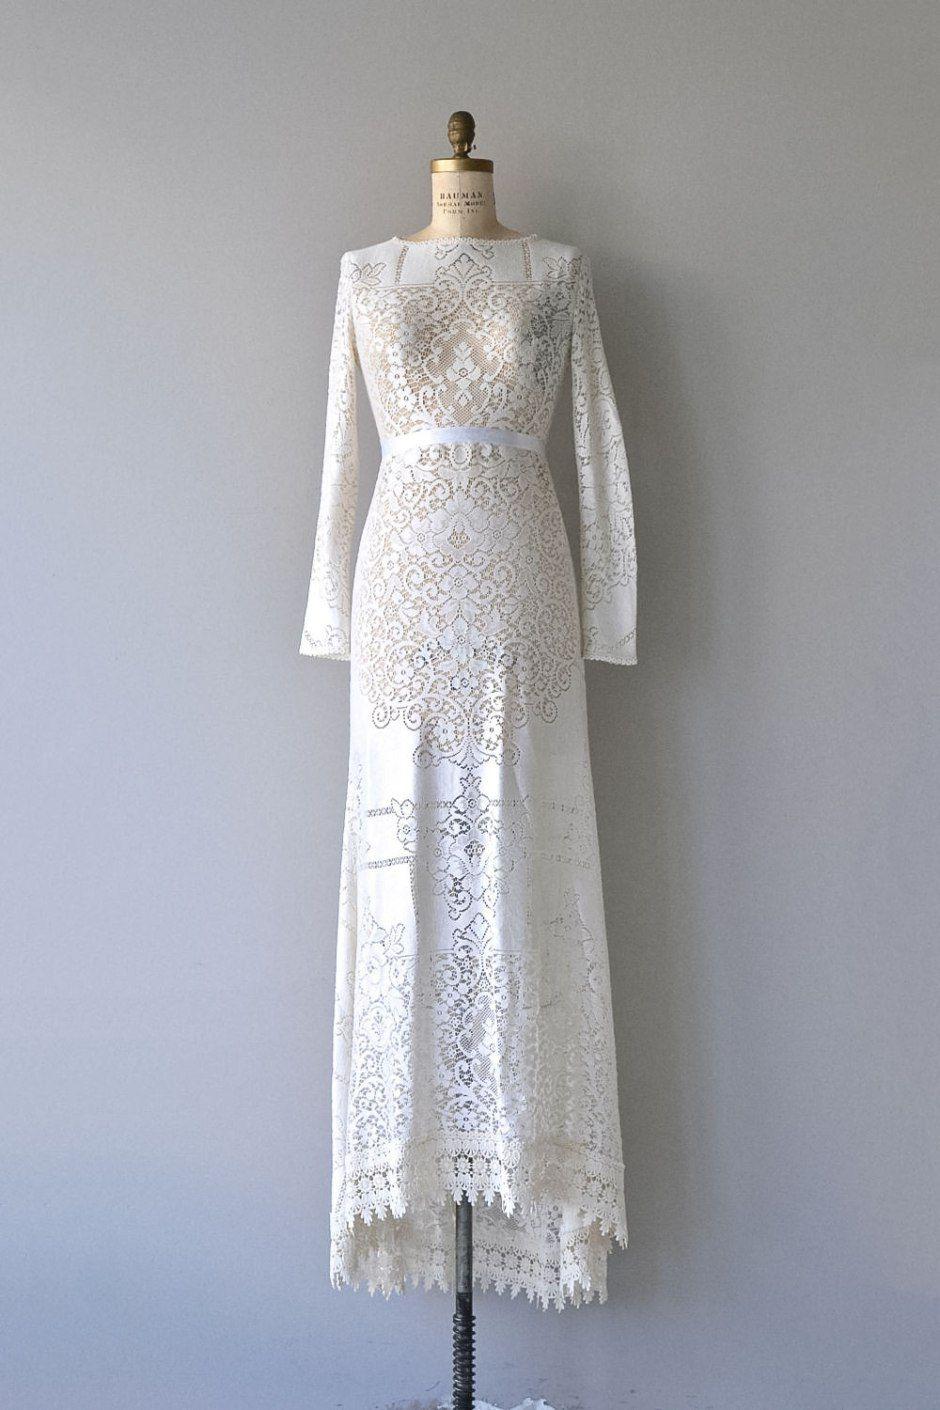 1970s wedding dress  dear golden vintage wedding dresses daily something  Home Design